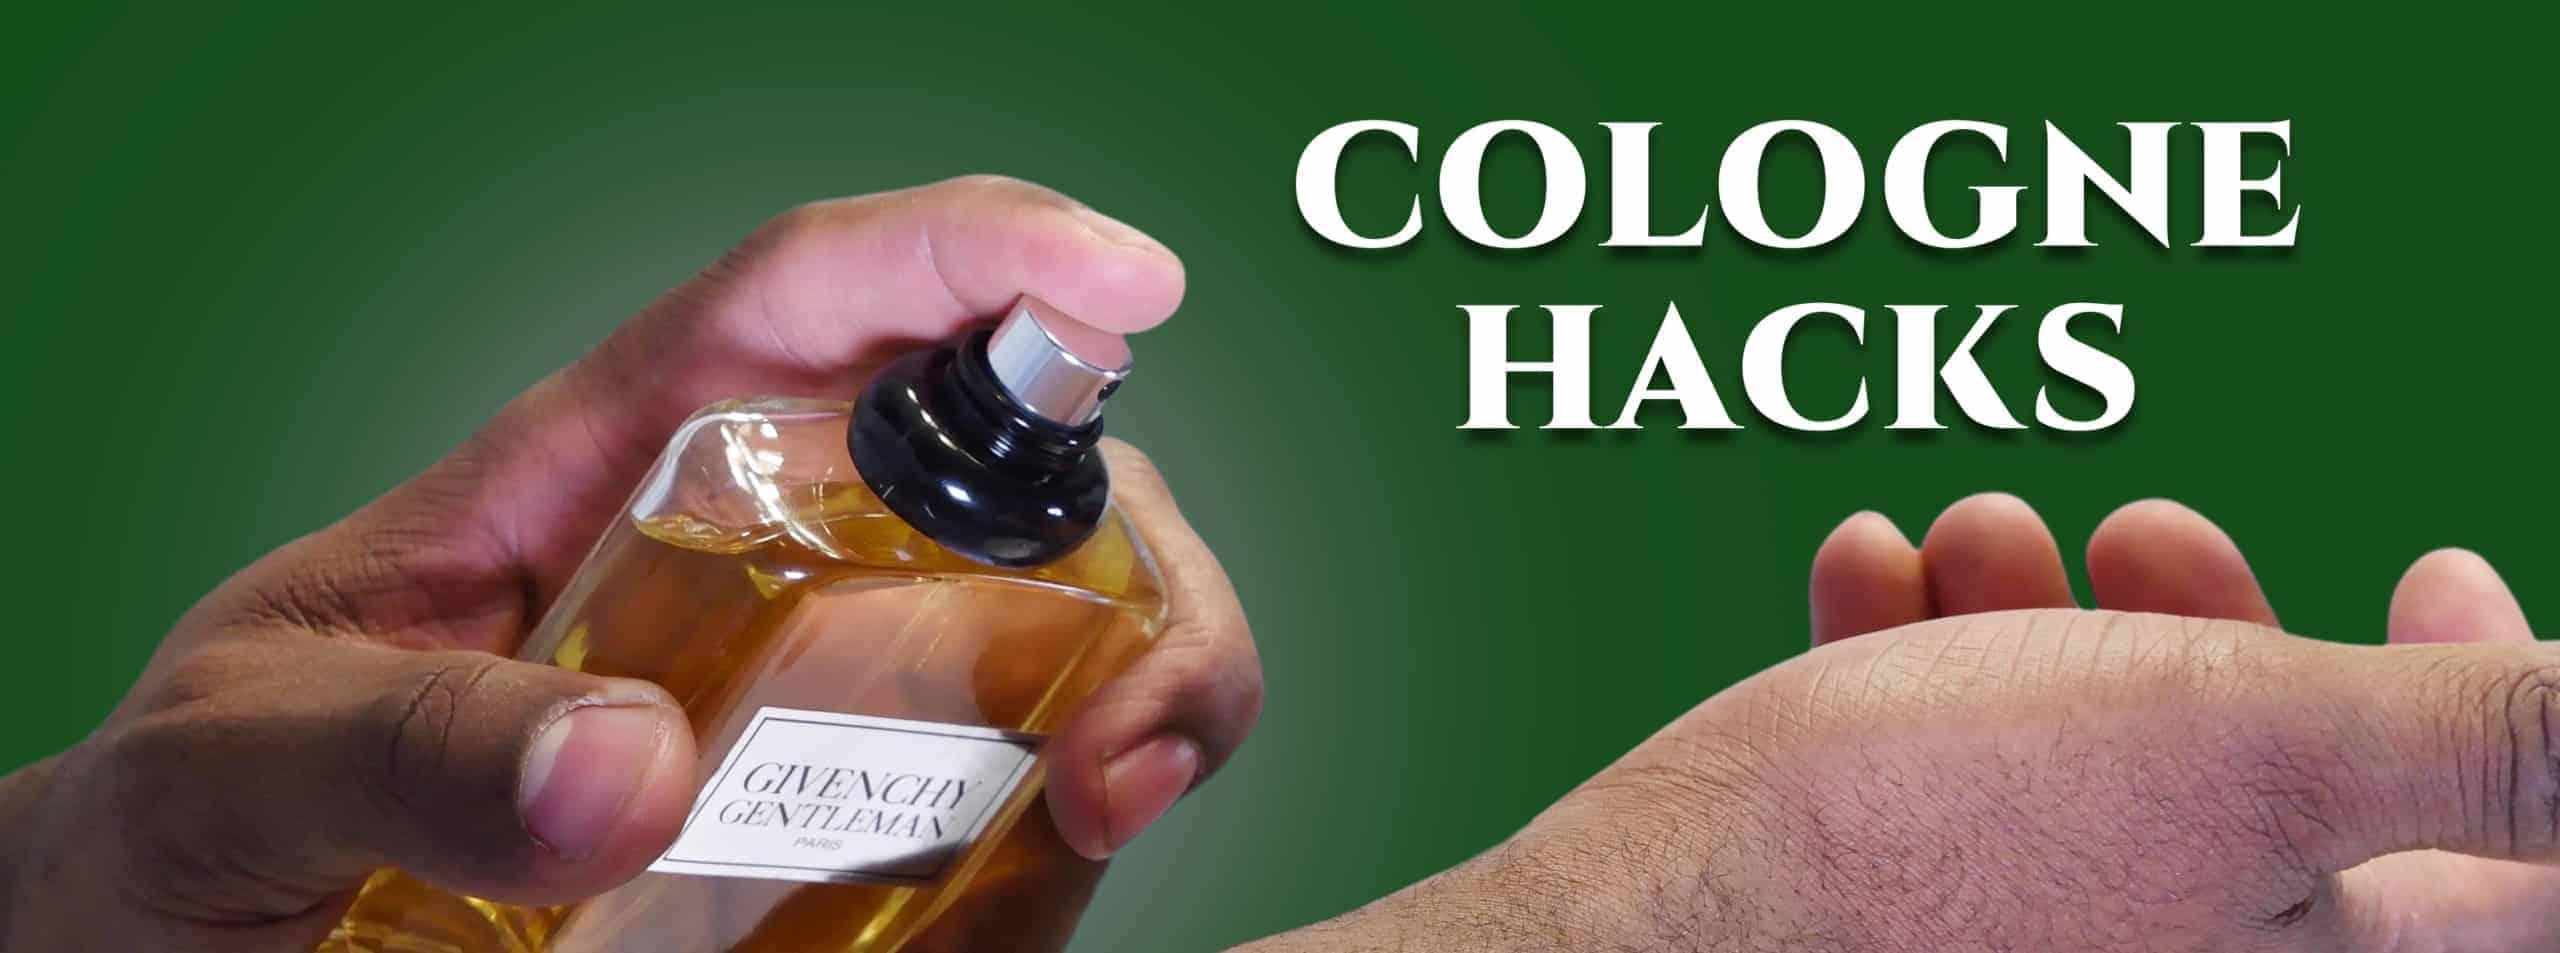 10 Cologne Hacks For Men How To Make Fragrances Last Longer